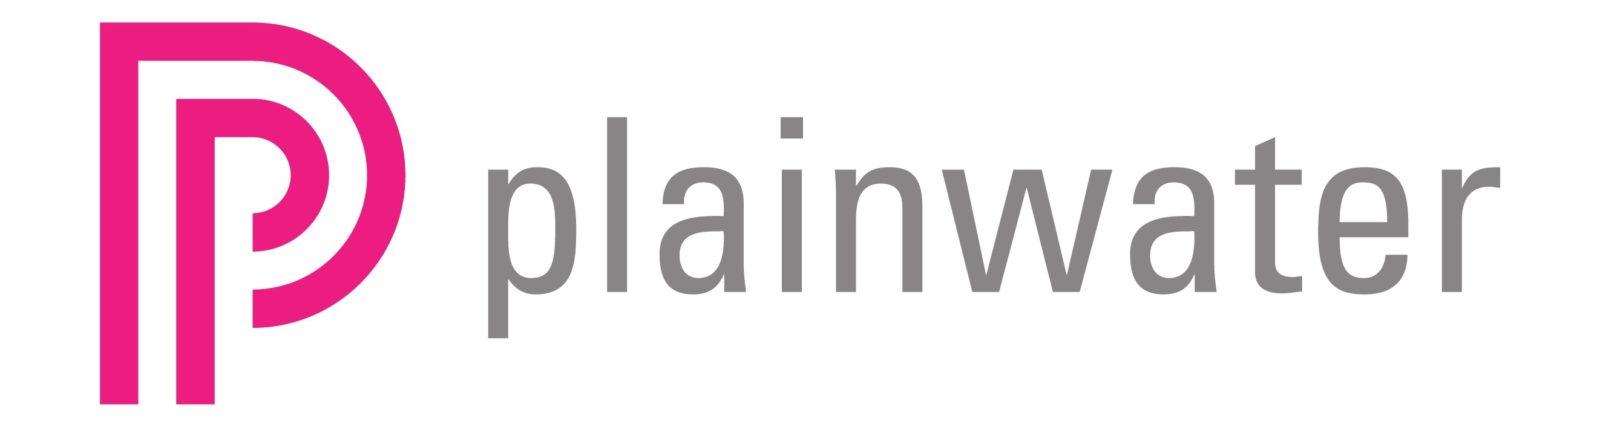 Plainwater